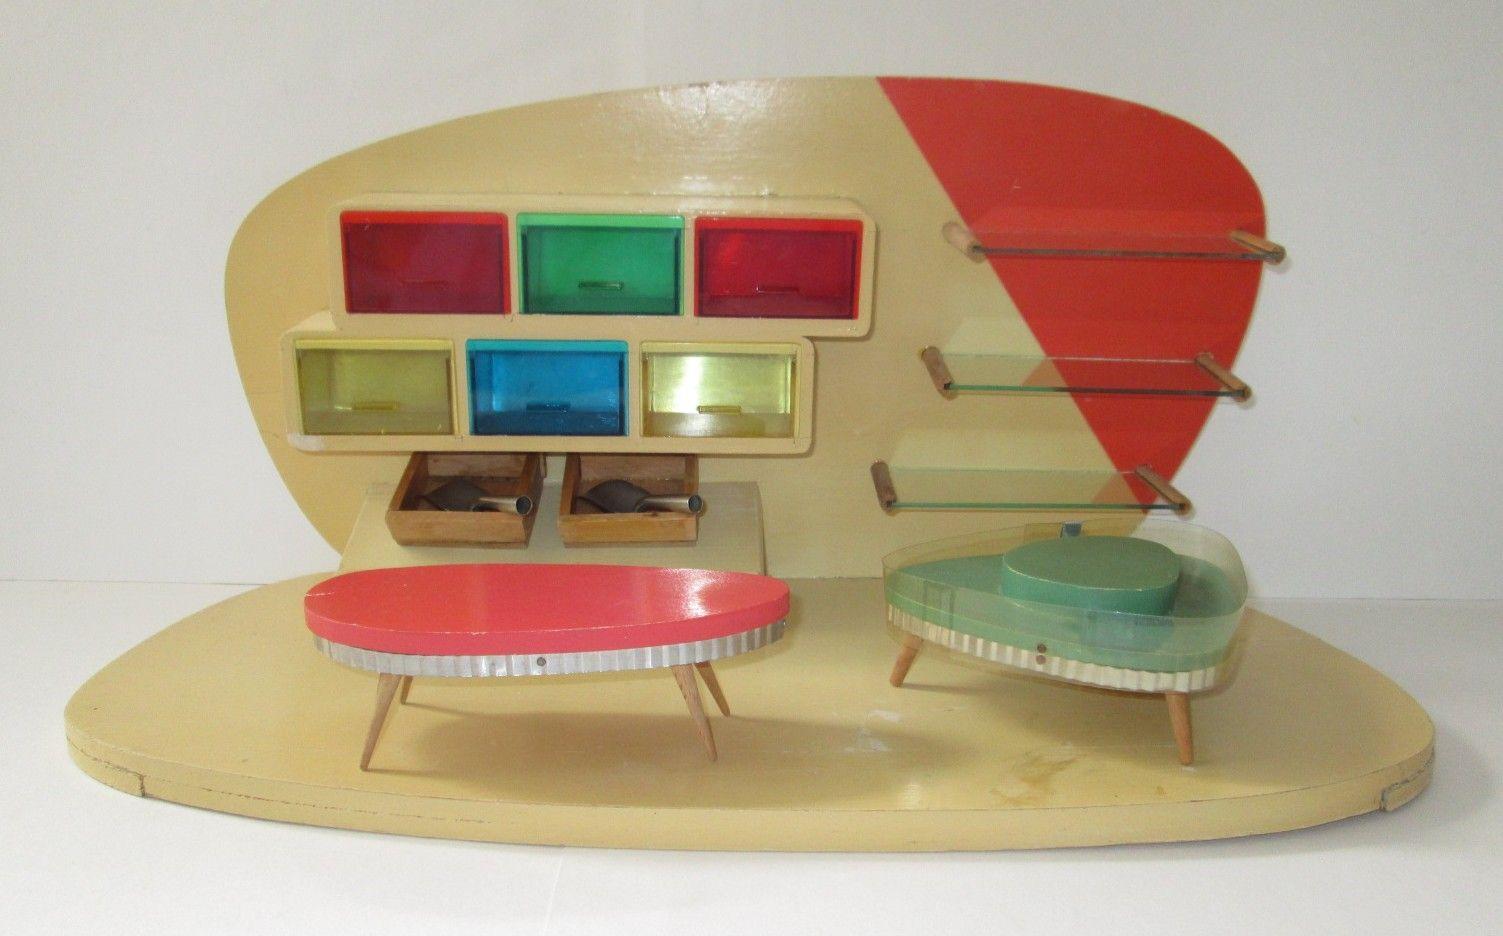 diePuppenstubensammlerin: DDR-Kaufläden - Shops made in East-Germany